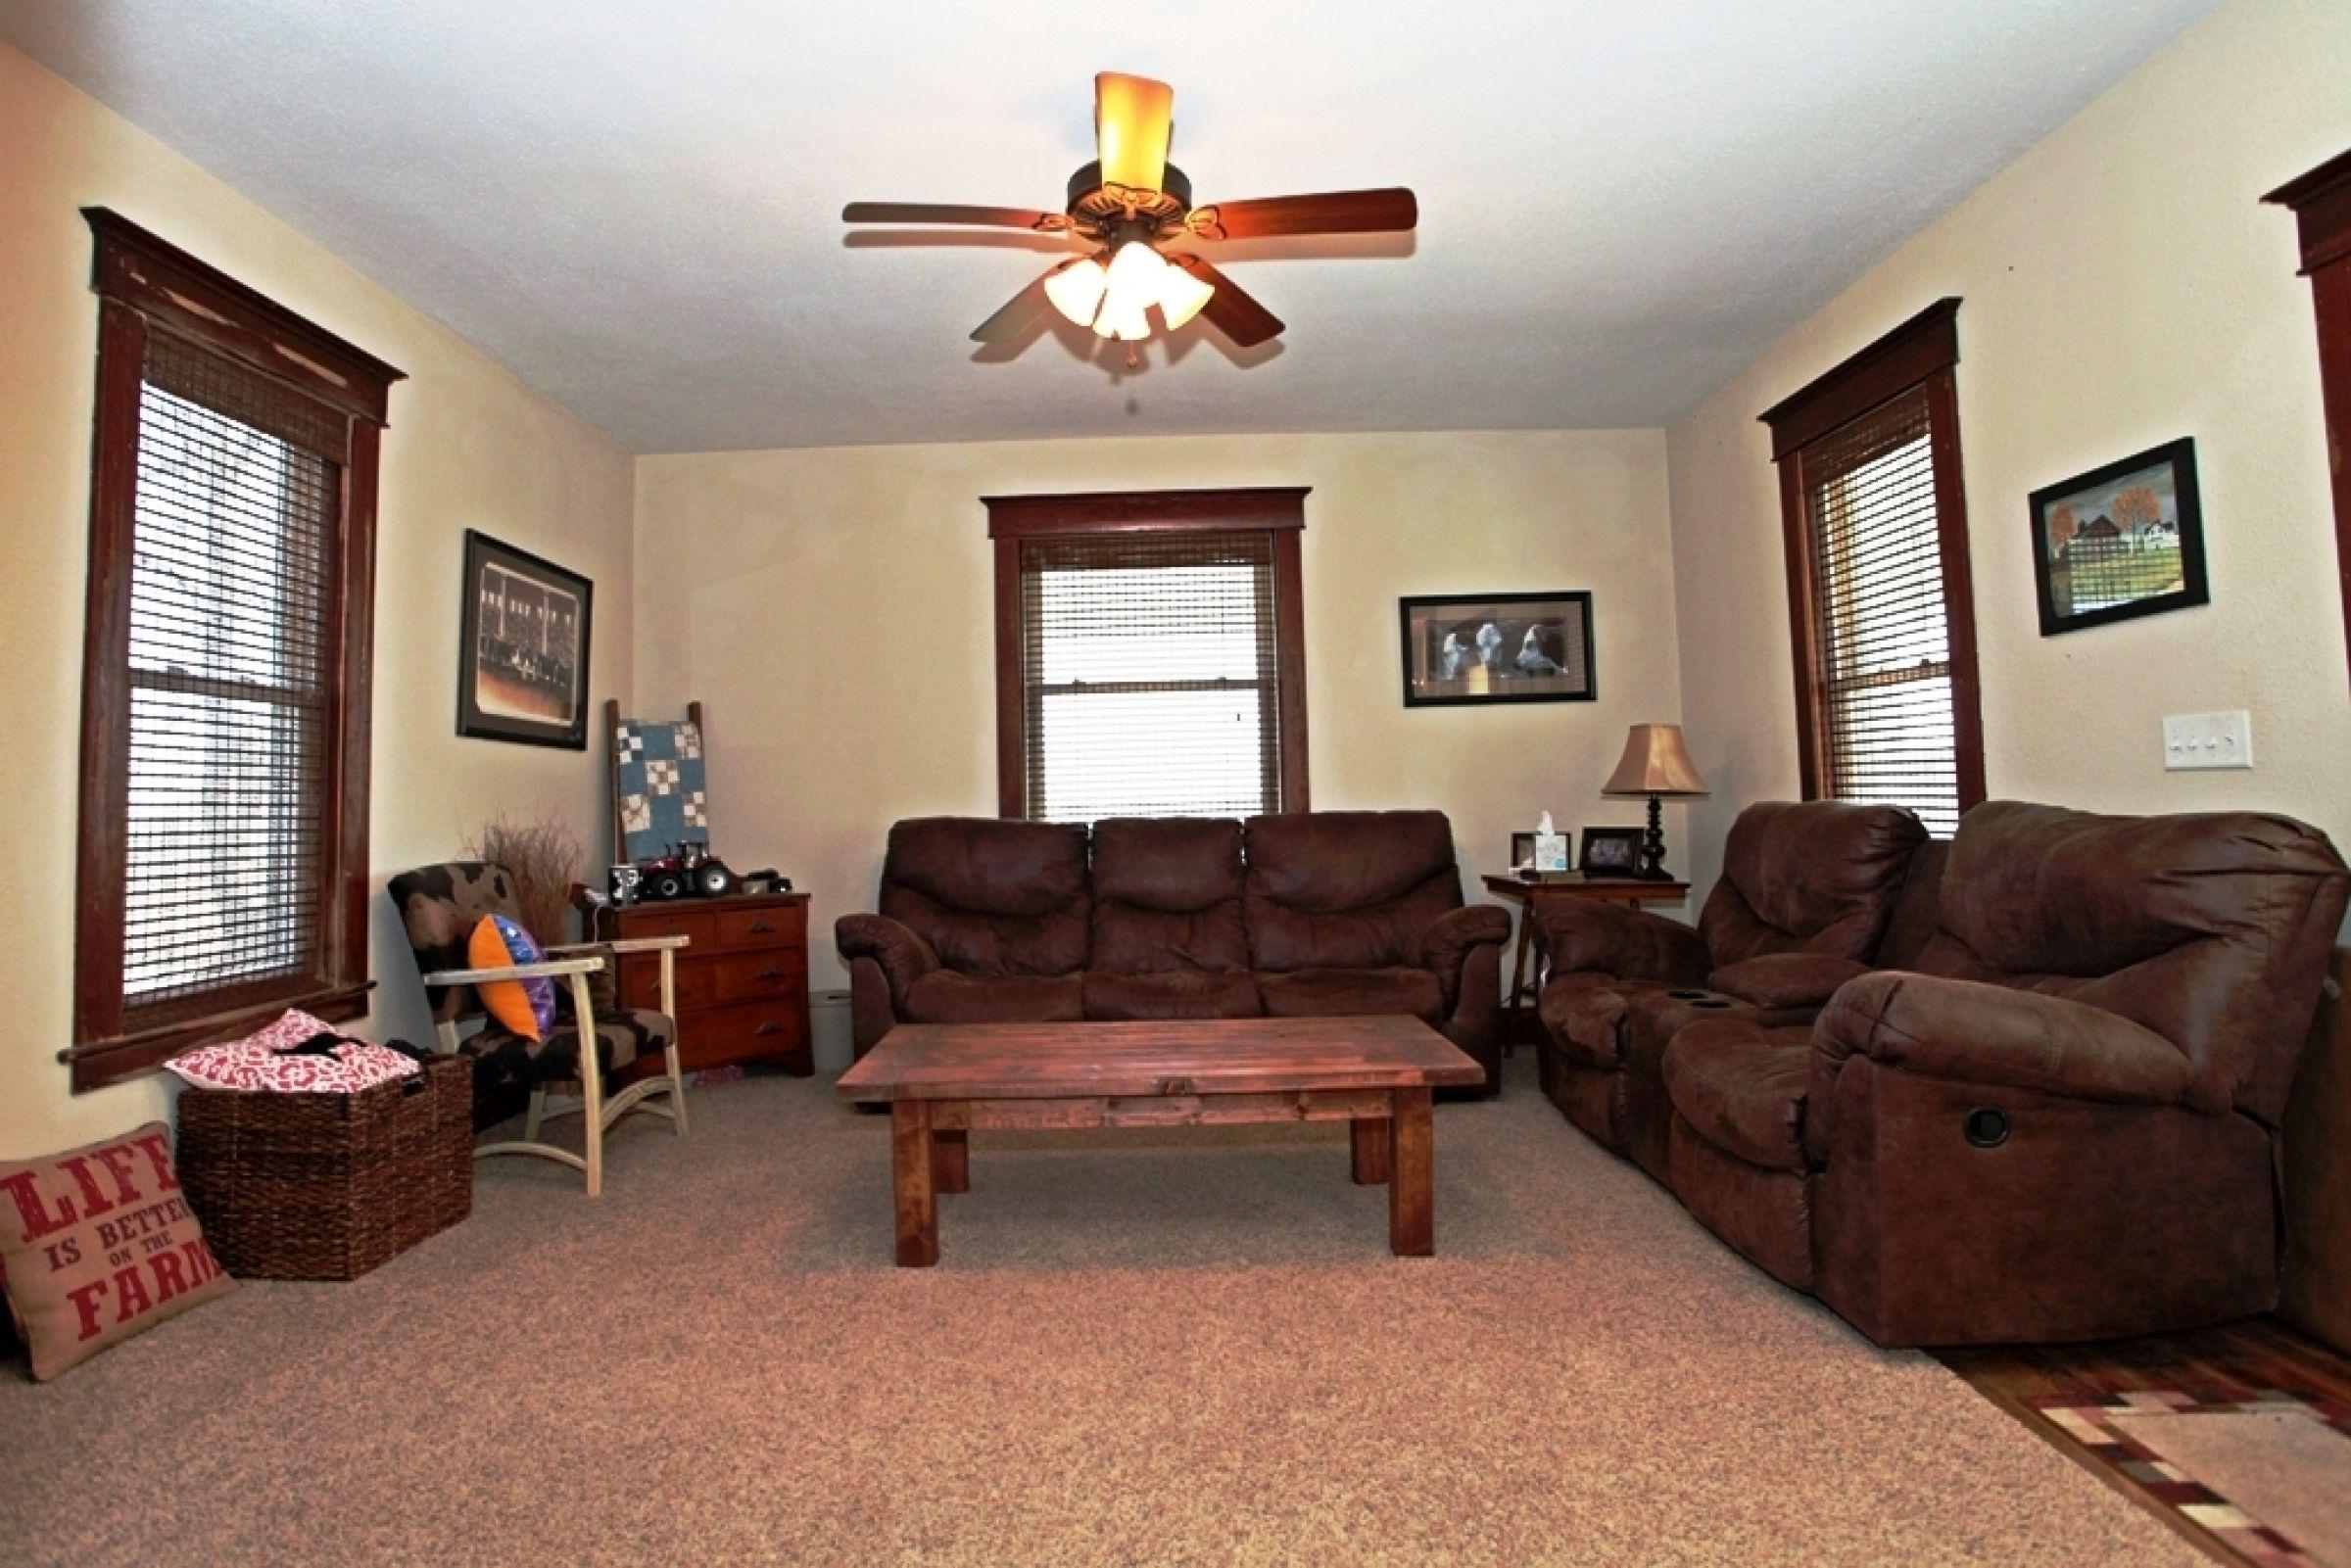 residential-wayne-county-iowa-1-acres-listing-number-15243-10-2020-11-05-200146.JPG